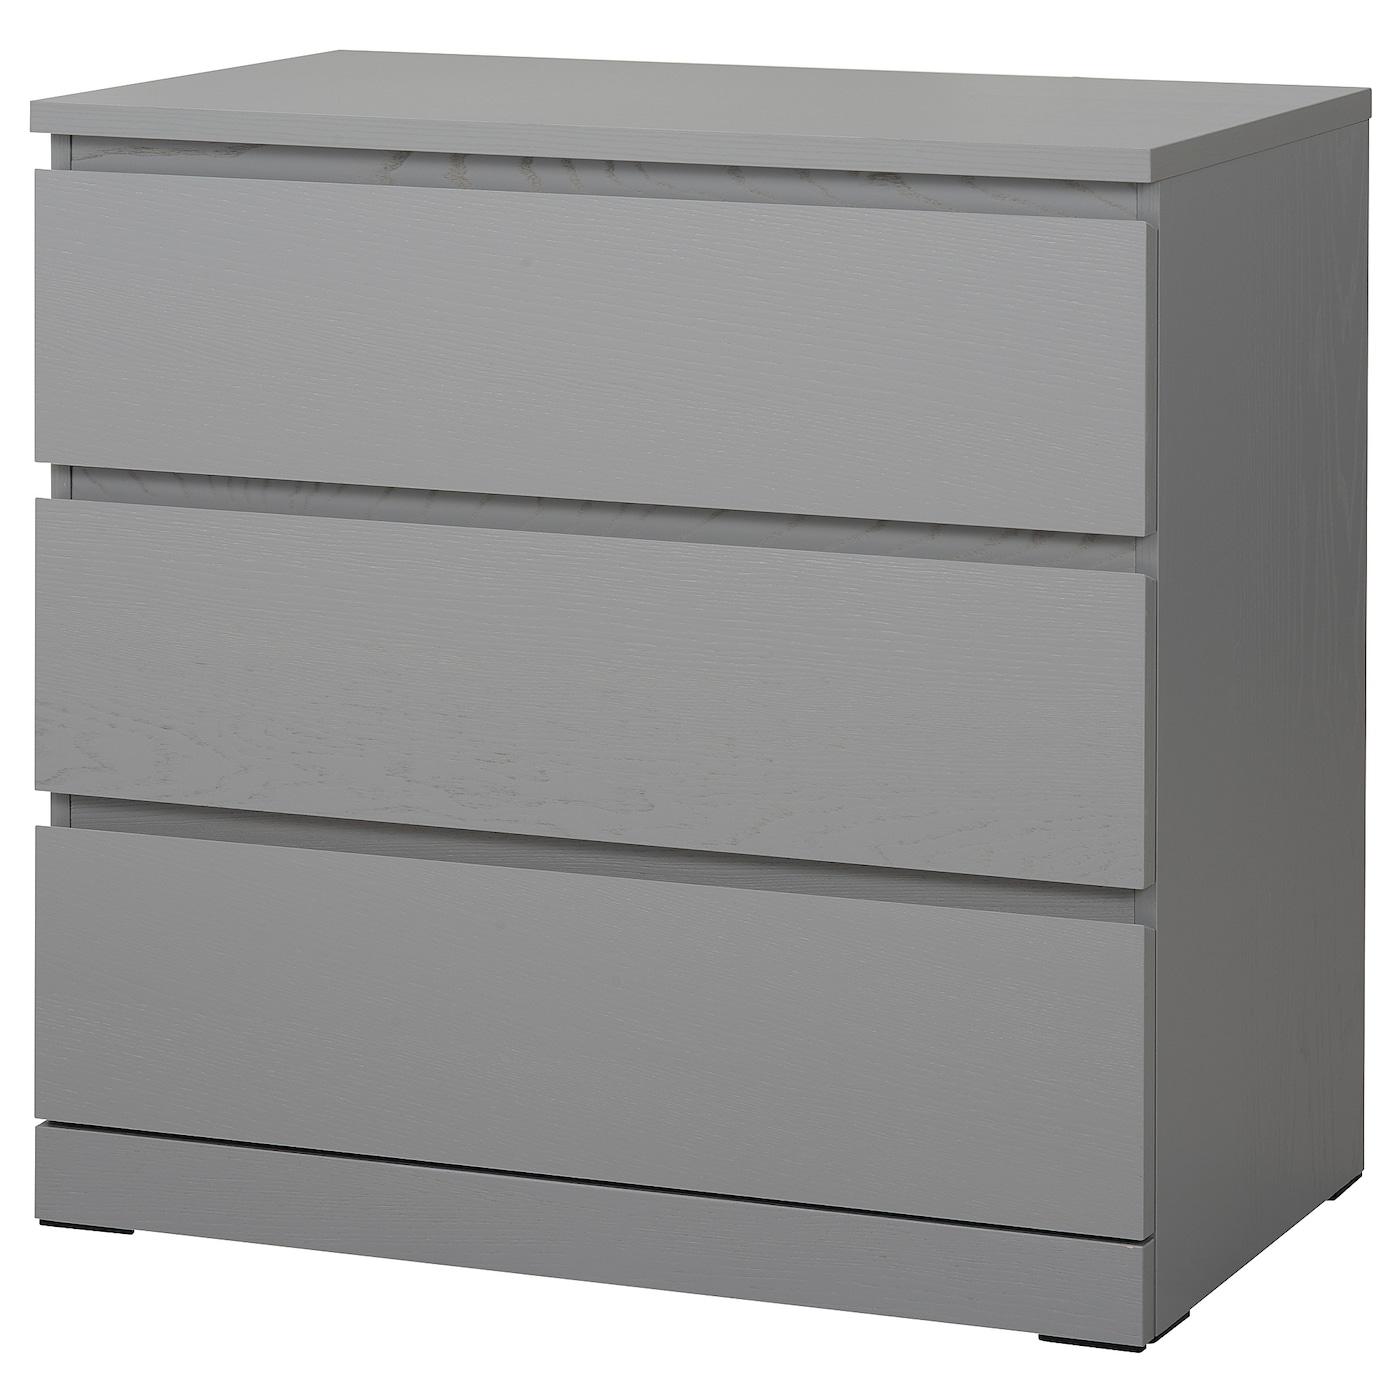 Braune Ikea Brimnes Kommode